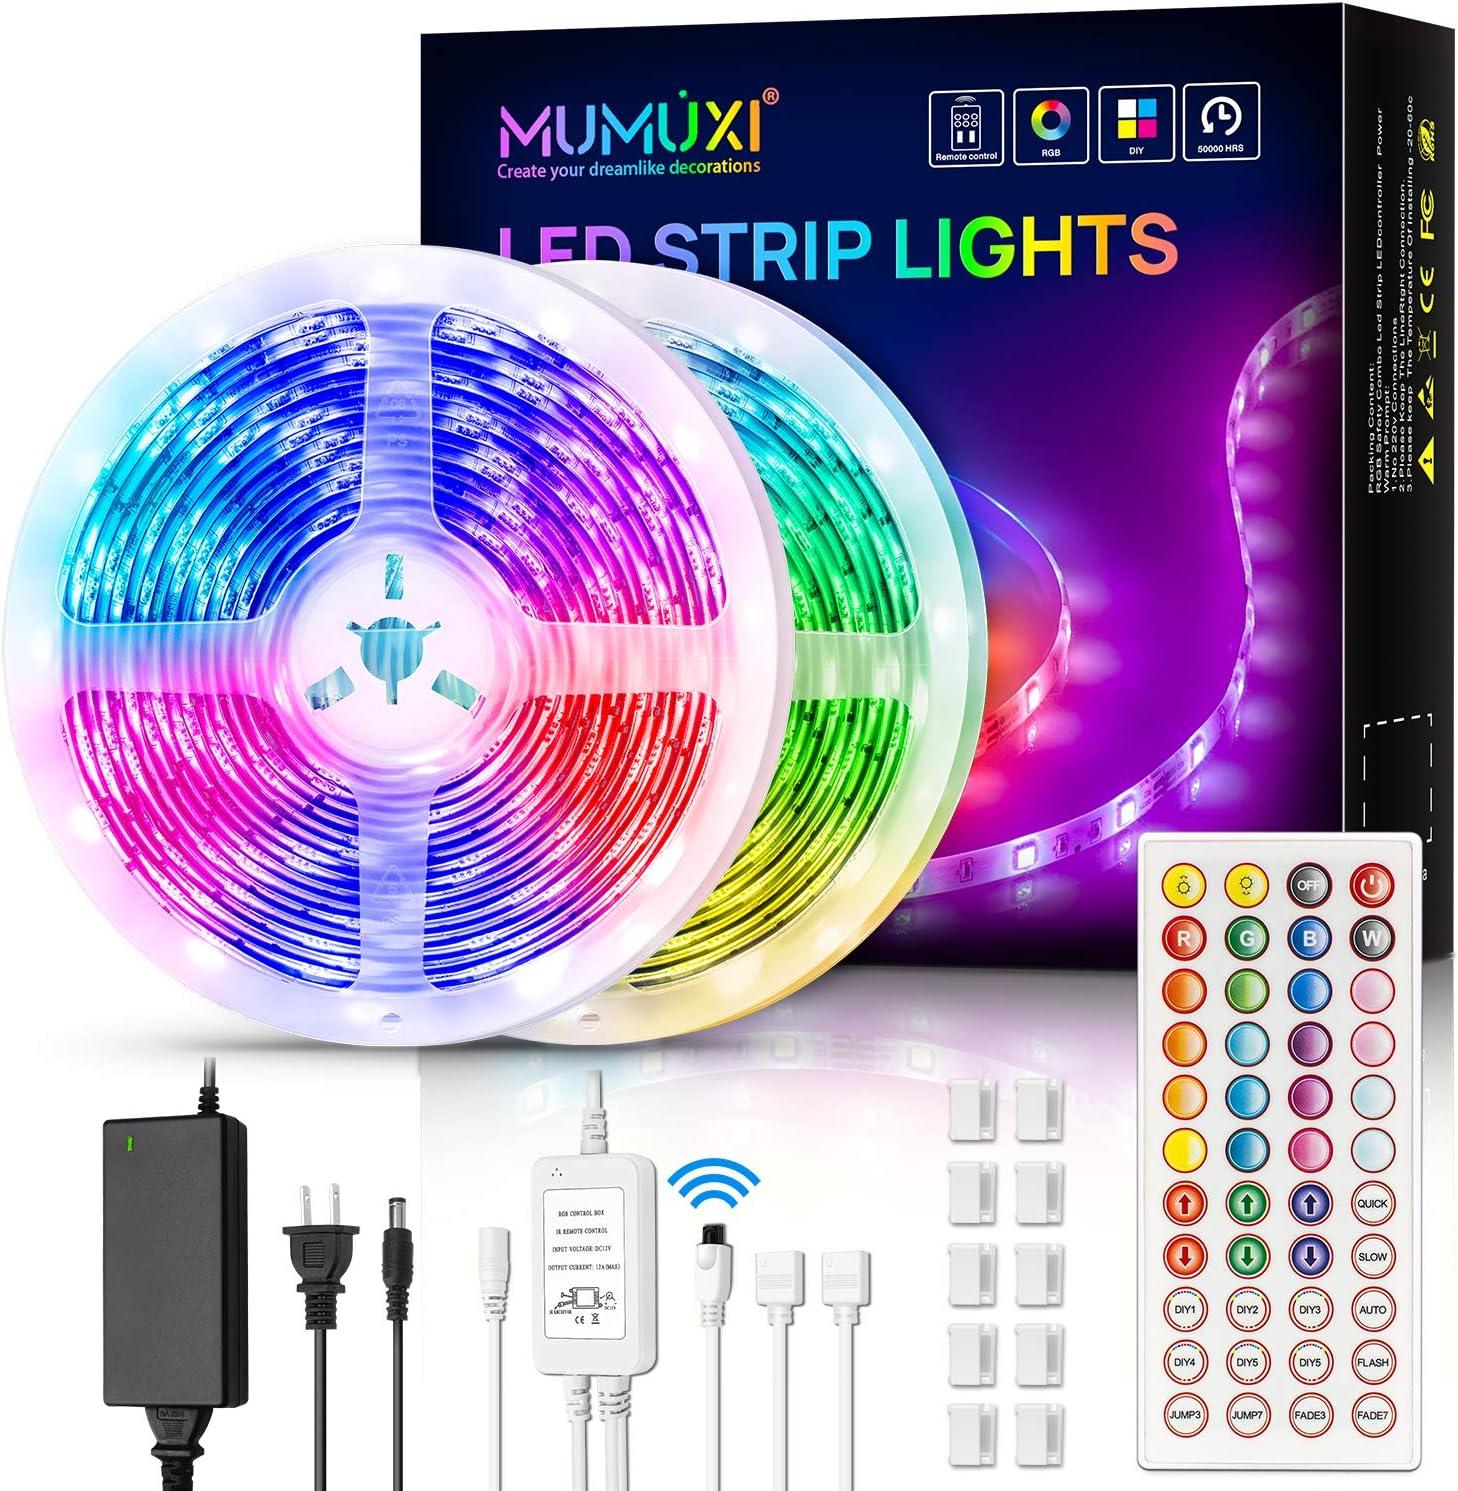 MUMUXI LED Strip Lights, 32.8ft Color Changing Led Light Strip 5050 RGB 300 LEDs Flexible LED Tape Light Kit with 44 Keys Remote Control and 12V Power Supply for Room, Bedroom, Bar, Home, Kitchen: Home Improvement